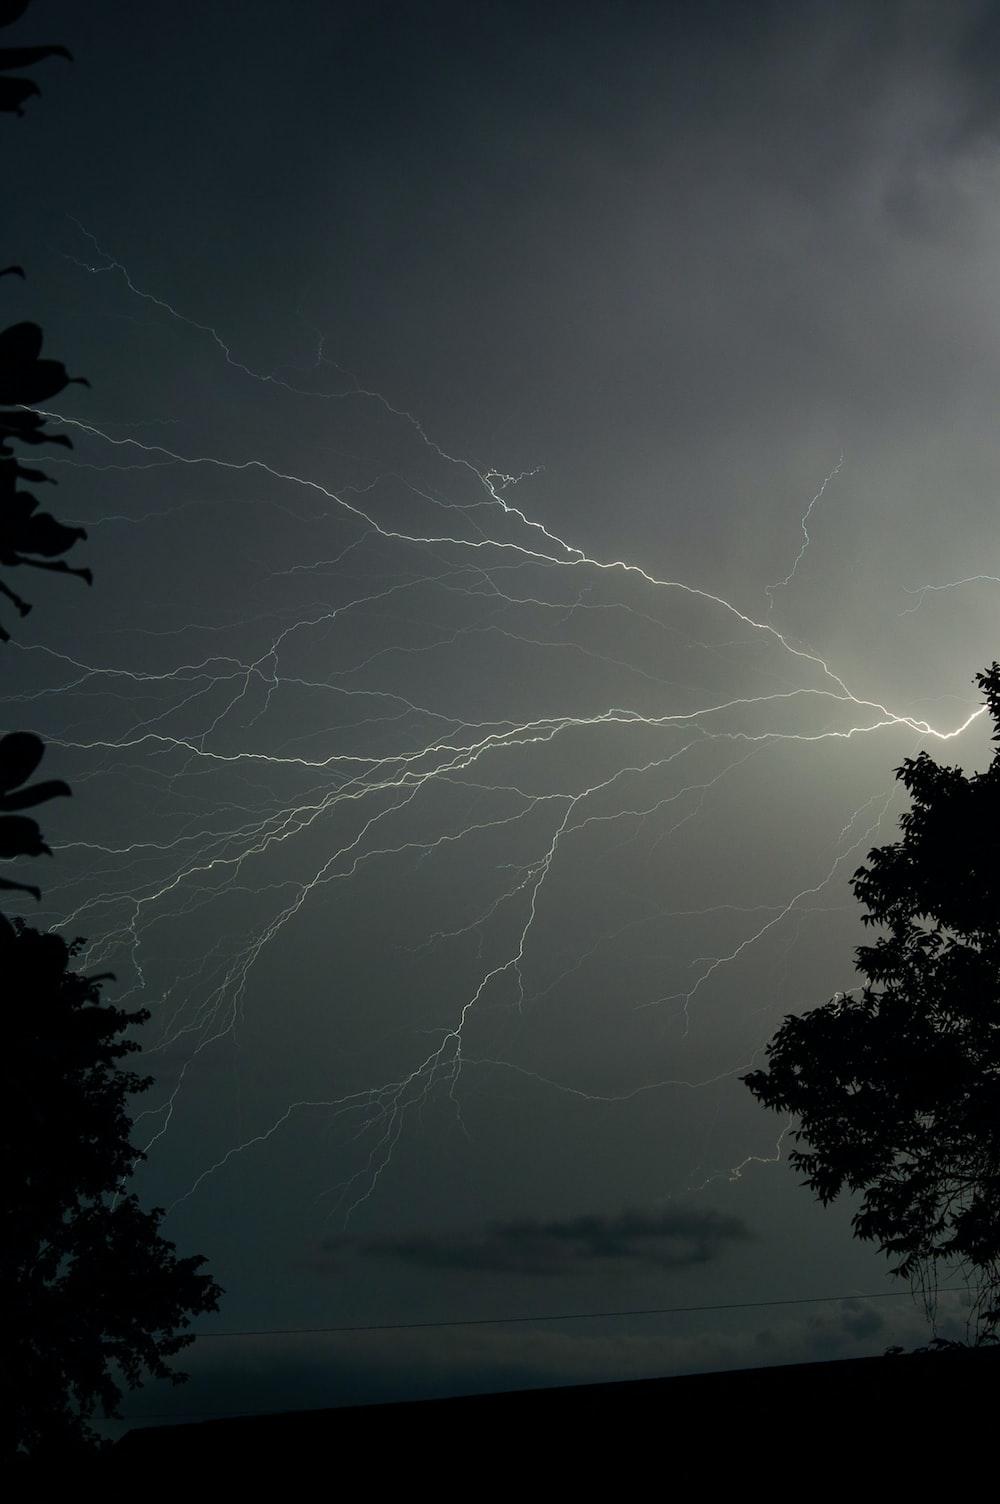 silhouette photo of lightning